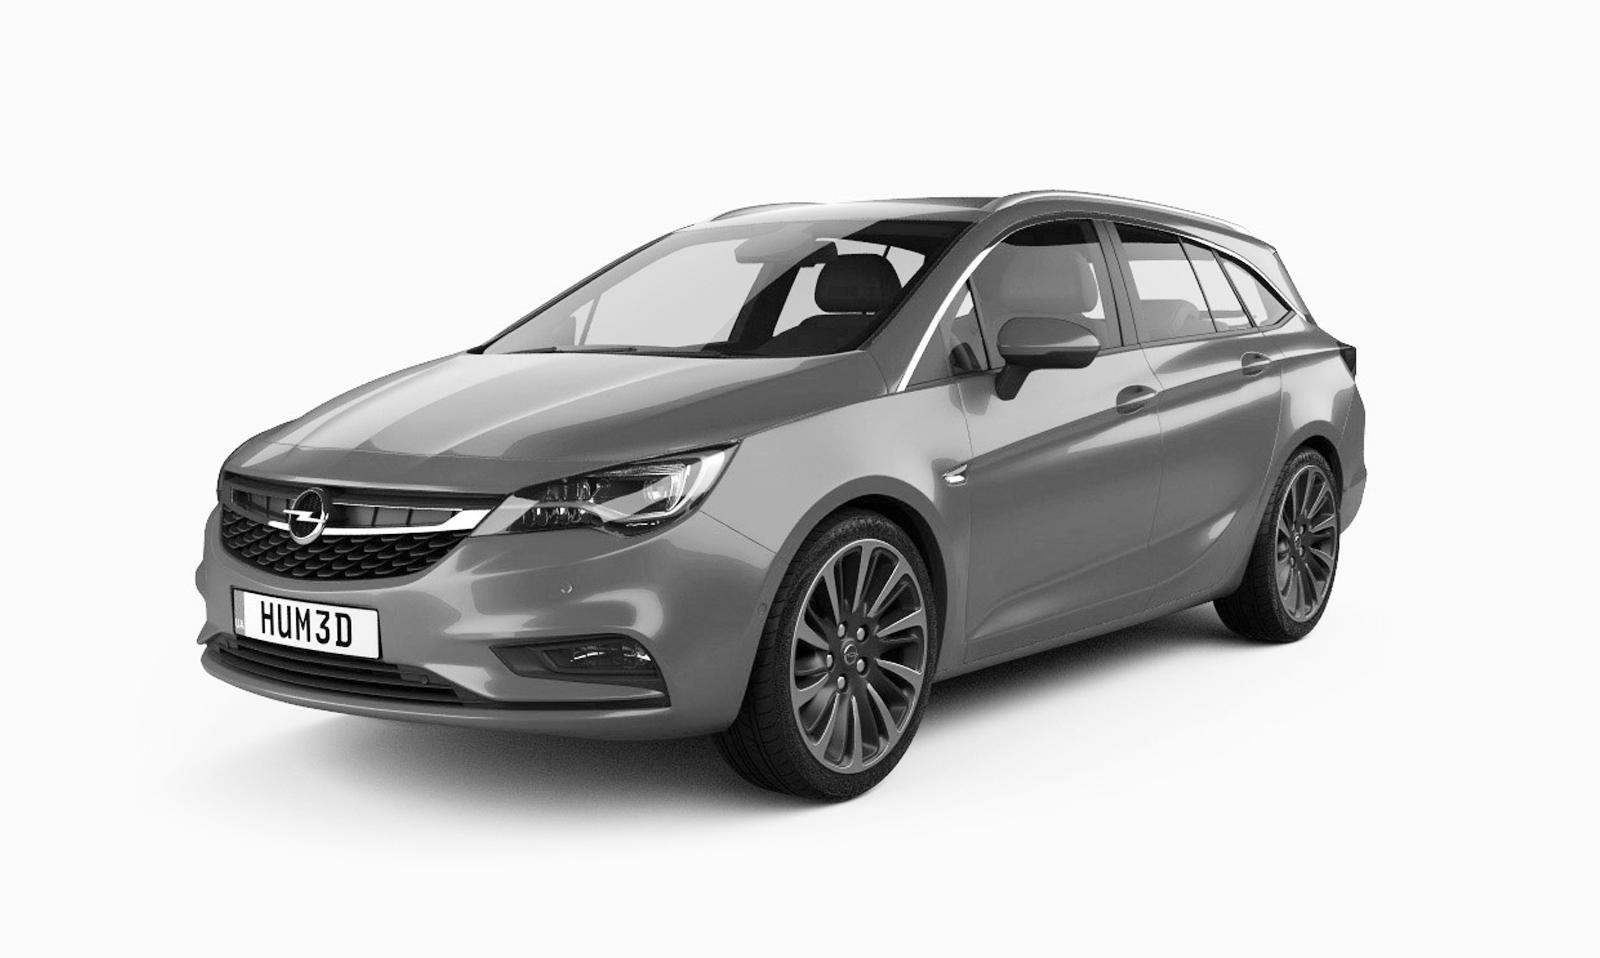 Inchirieri Auto Masini Ieftine Bucuresti, Otopeni – Inchirieri Opel Astra K - cutie automata – Oferte speciale la inchiriere!